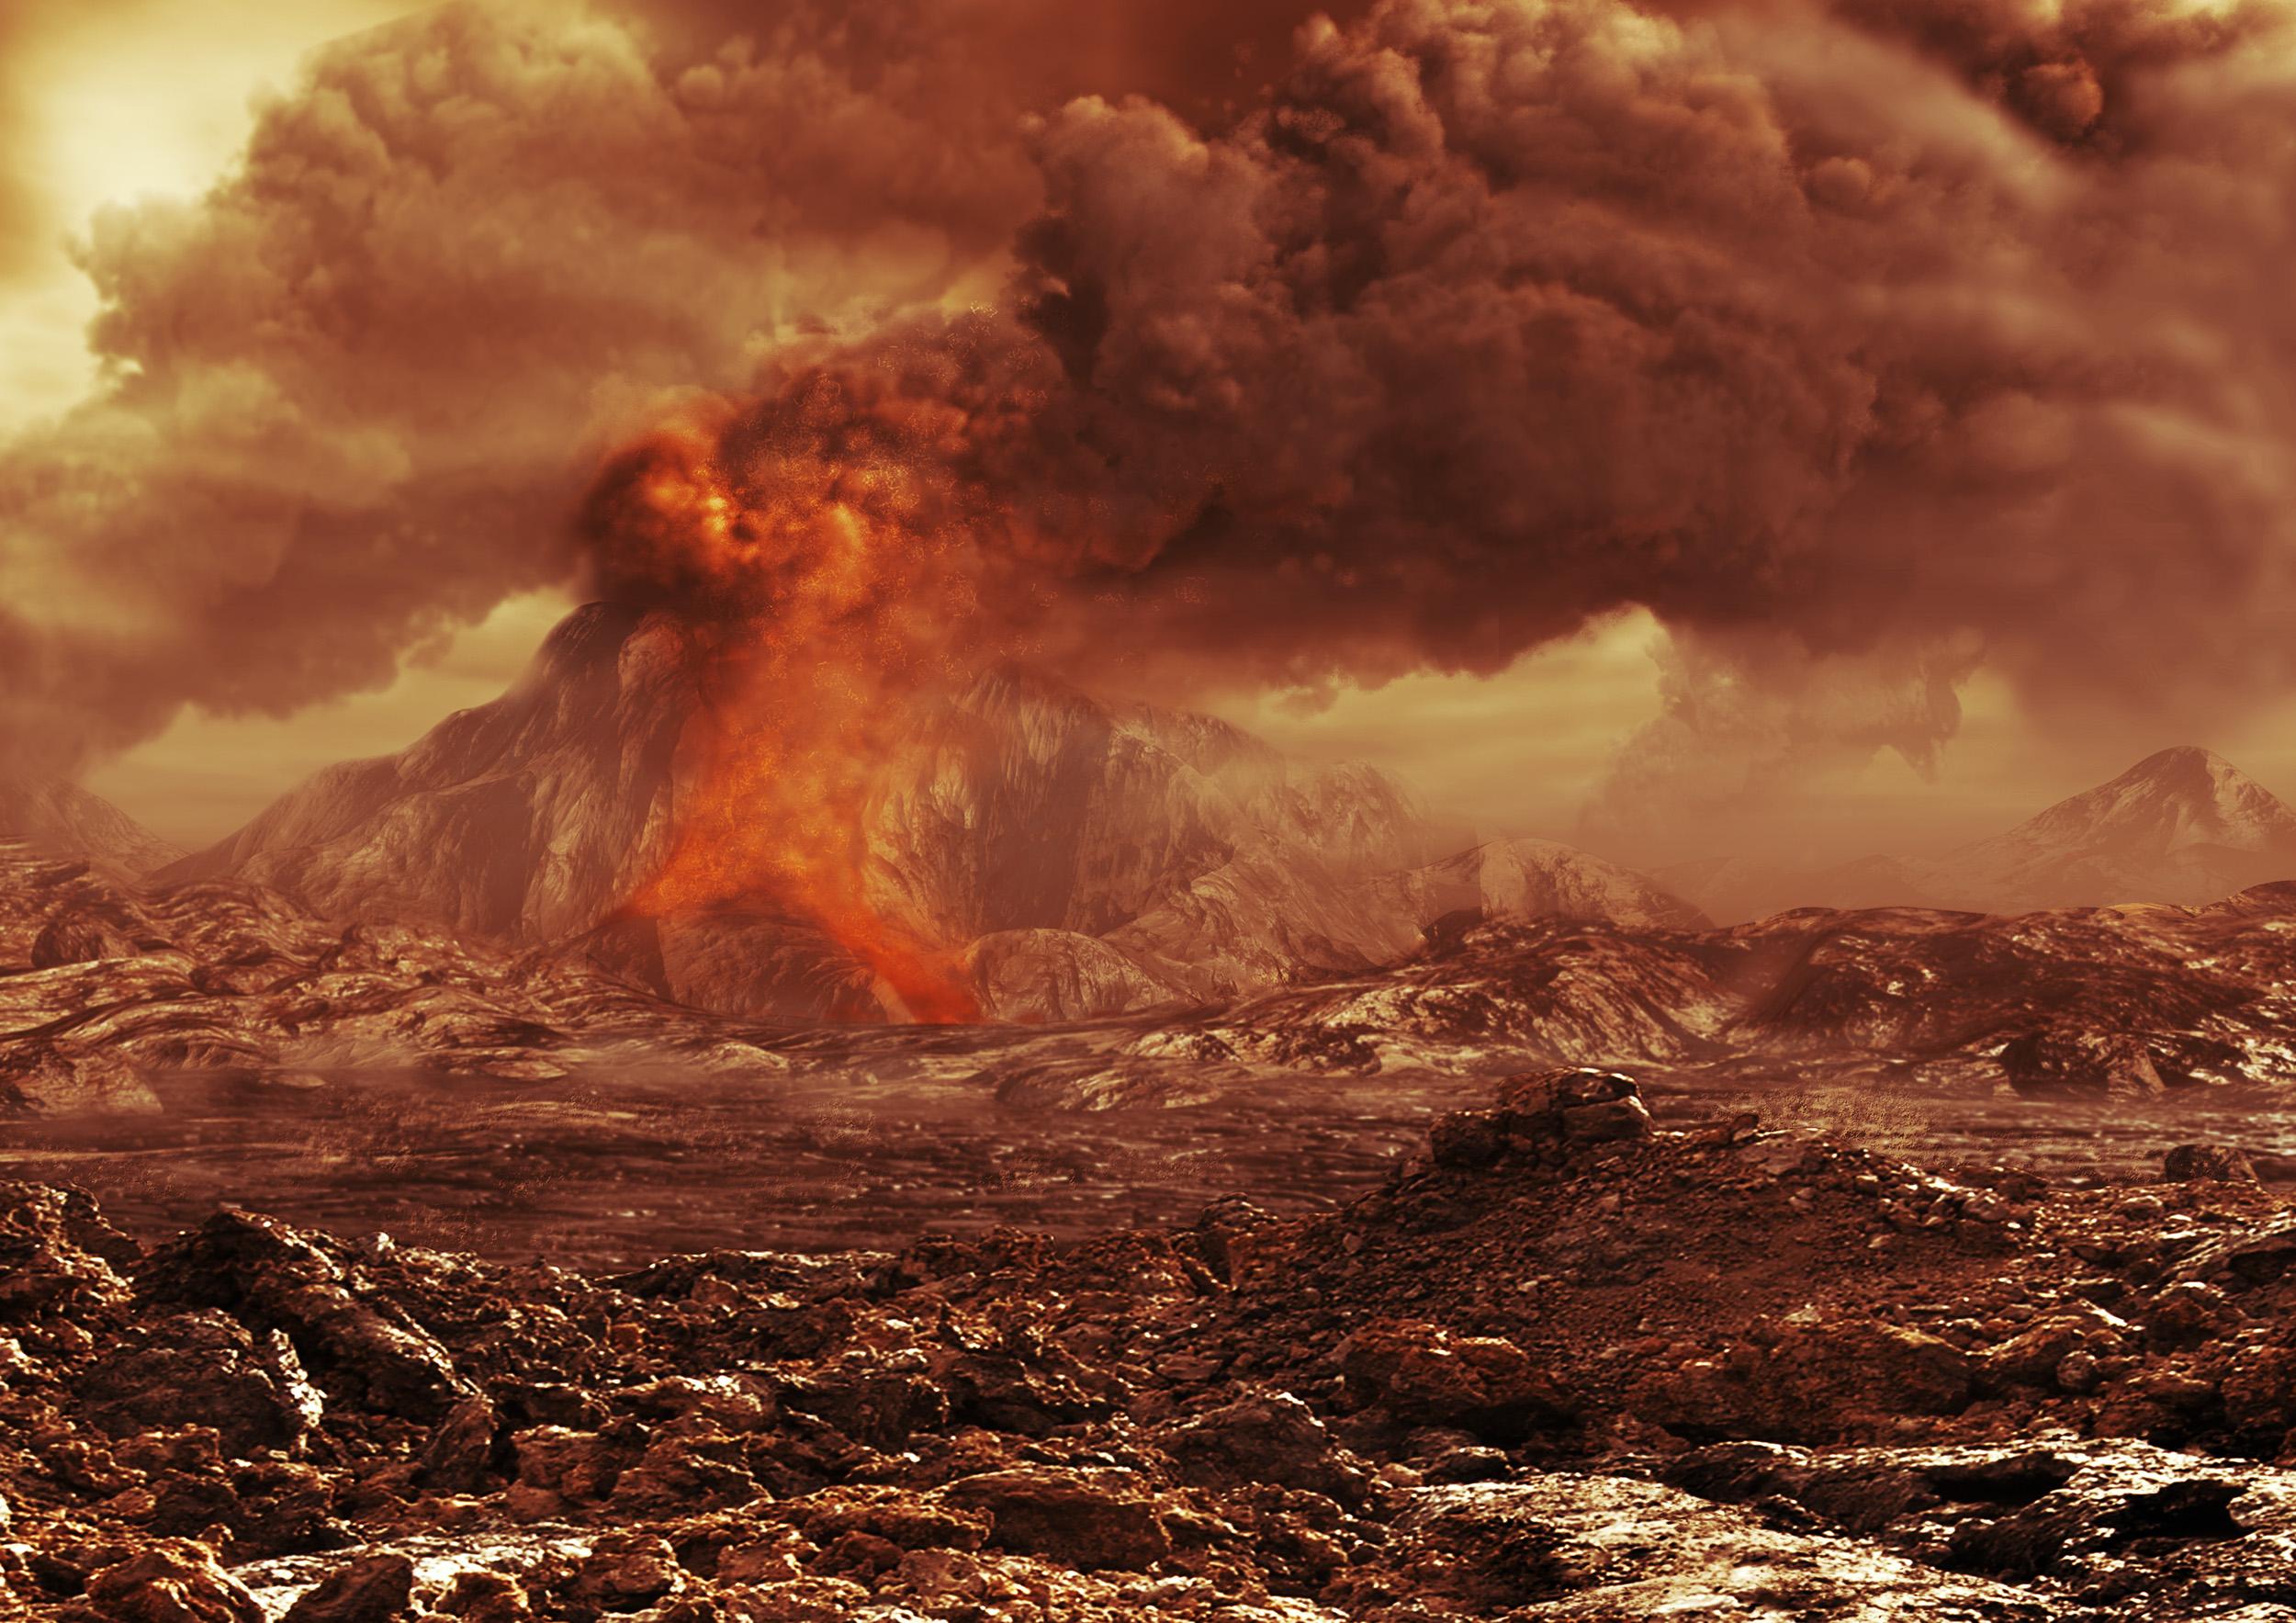 1567216834077-VenusExpress_Venus_volcanism.jpg